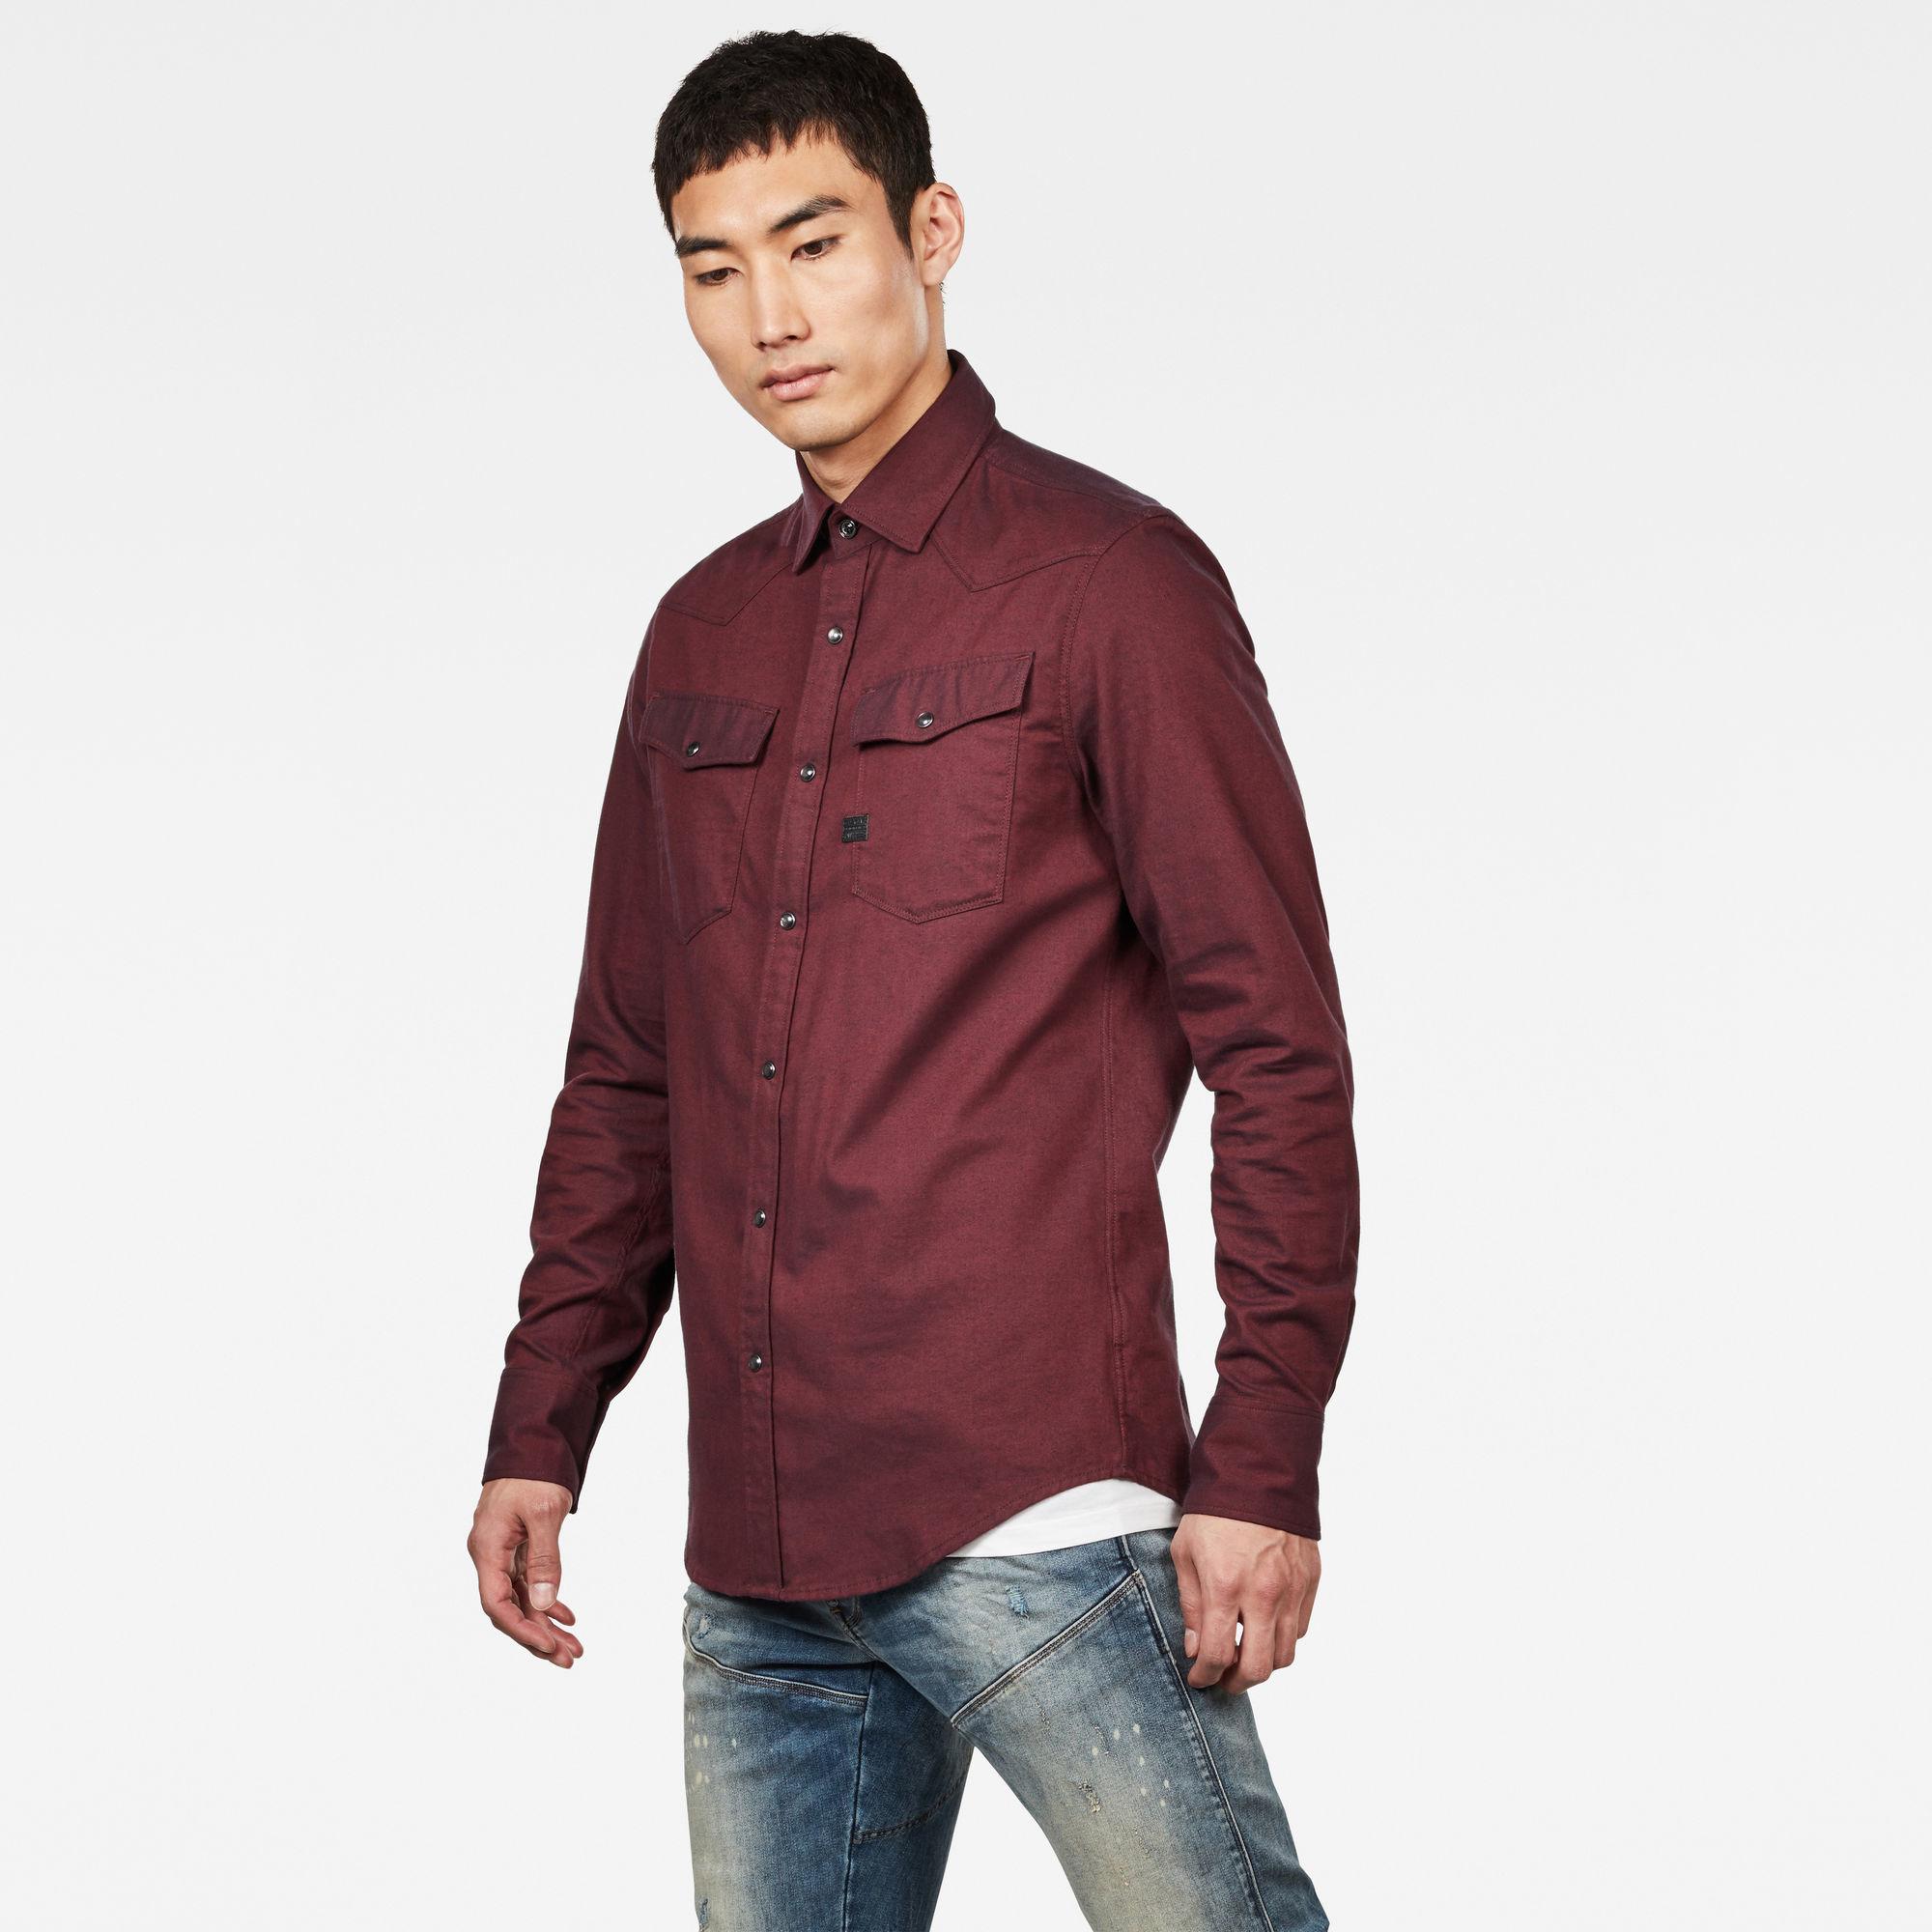 G-Star G-Star 3301 Slim Shirt Burned Red